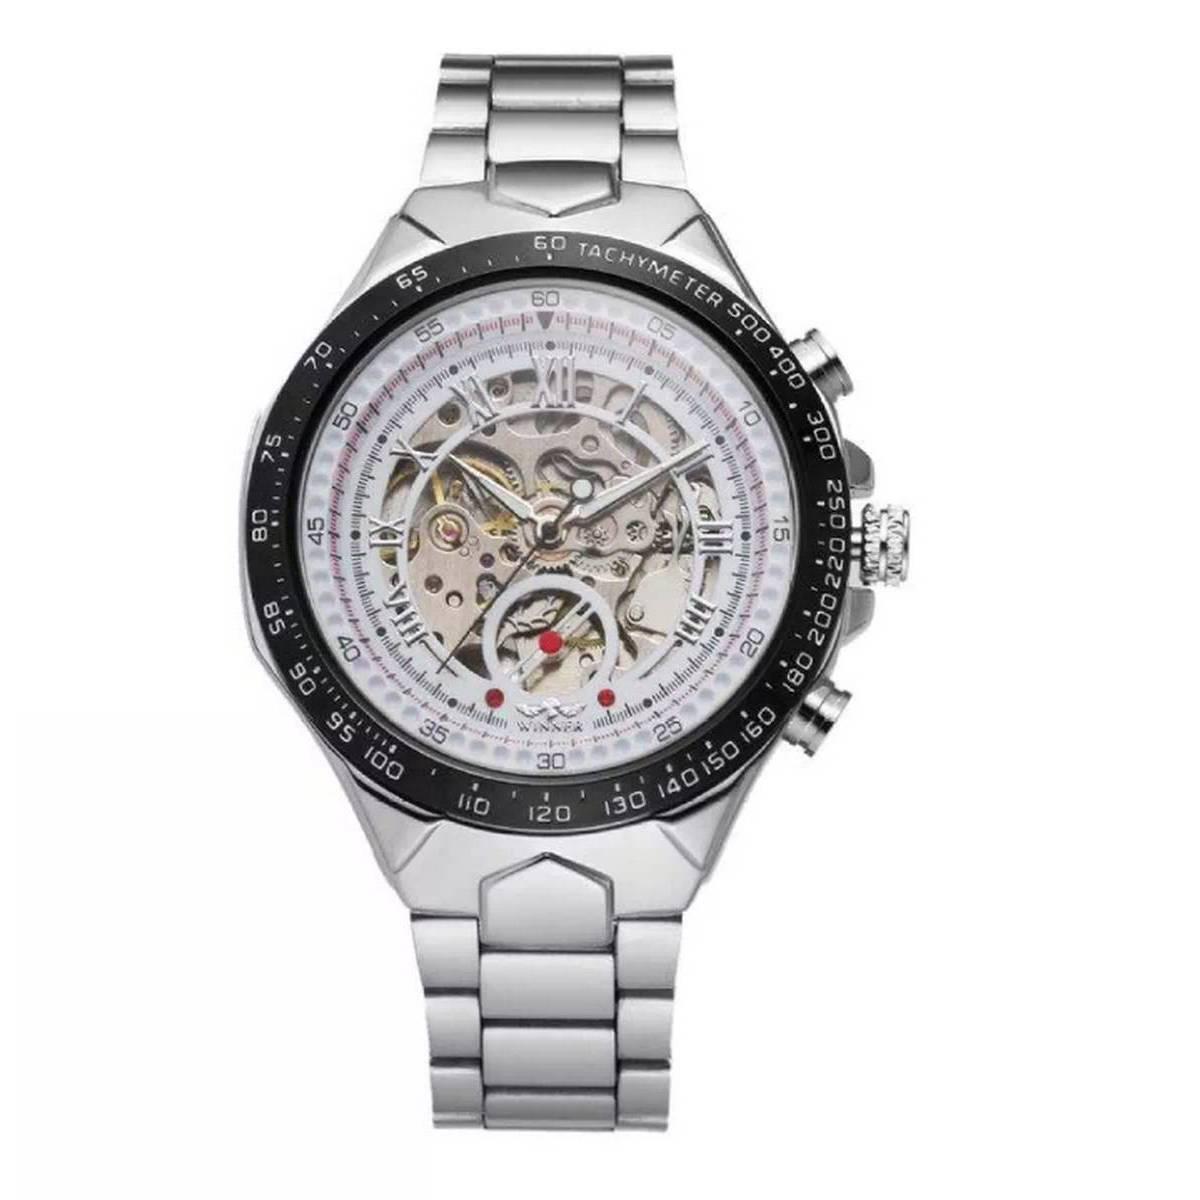 Winner Automatic Skeleton  Mechanical Watches Men's Golden Luxury Stainless Steel Wrist Watch for Men